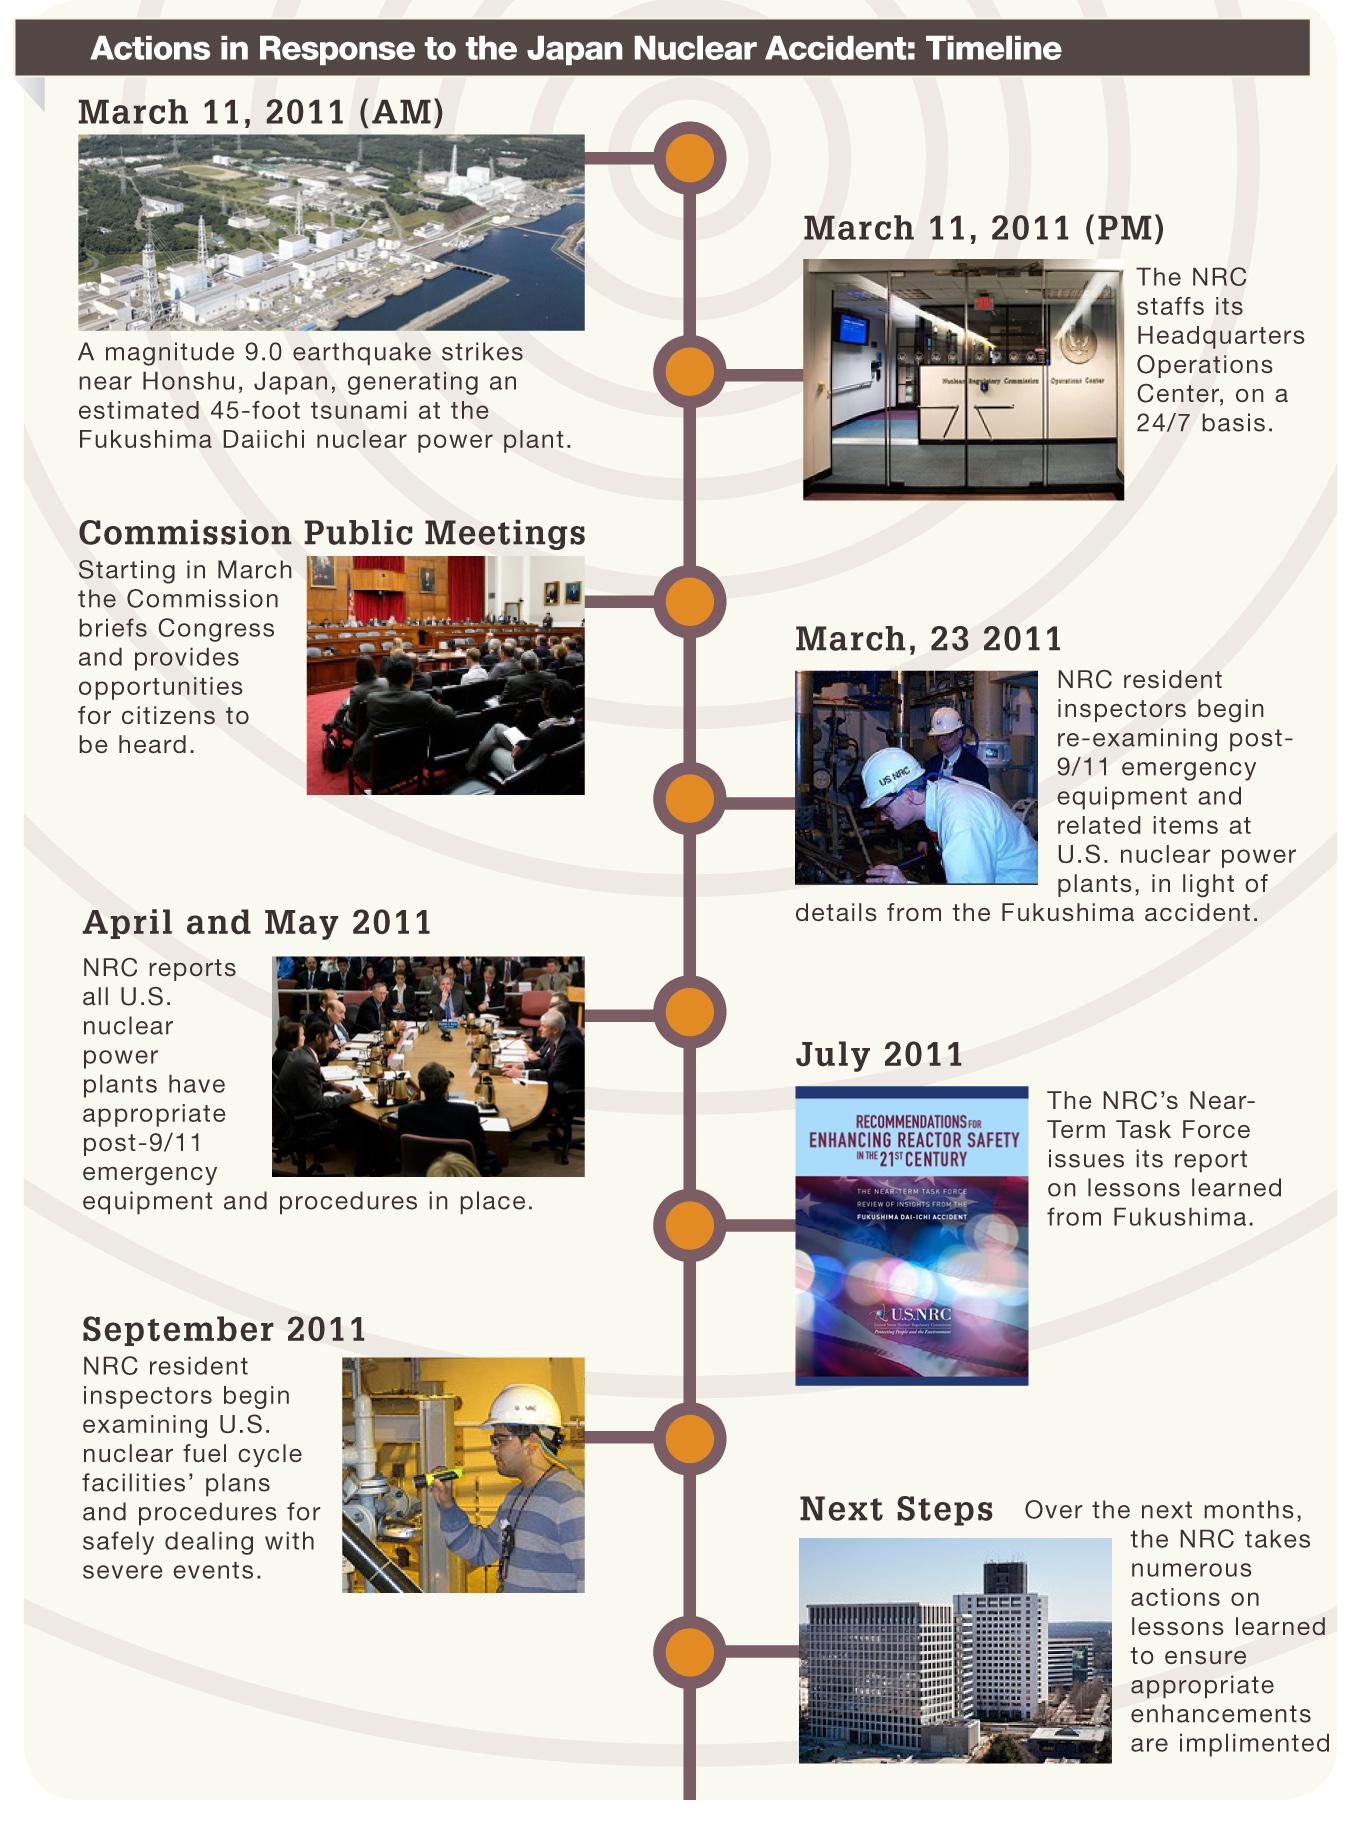 animated timeline details the nrc response to the fukushima accident